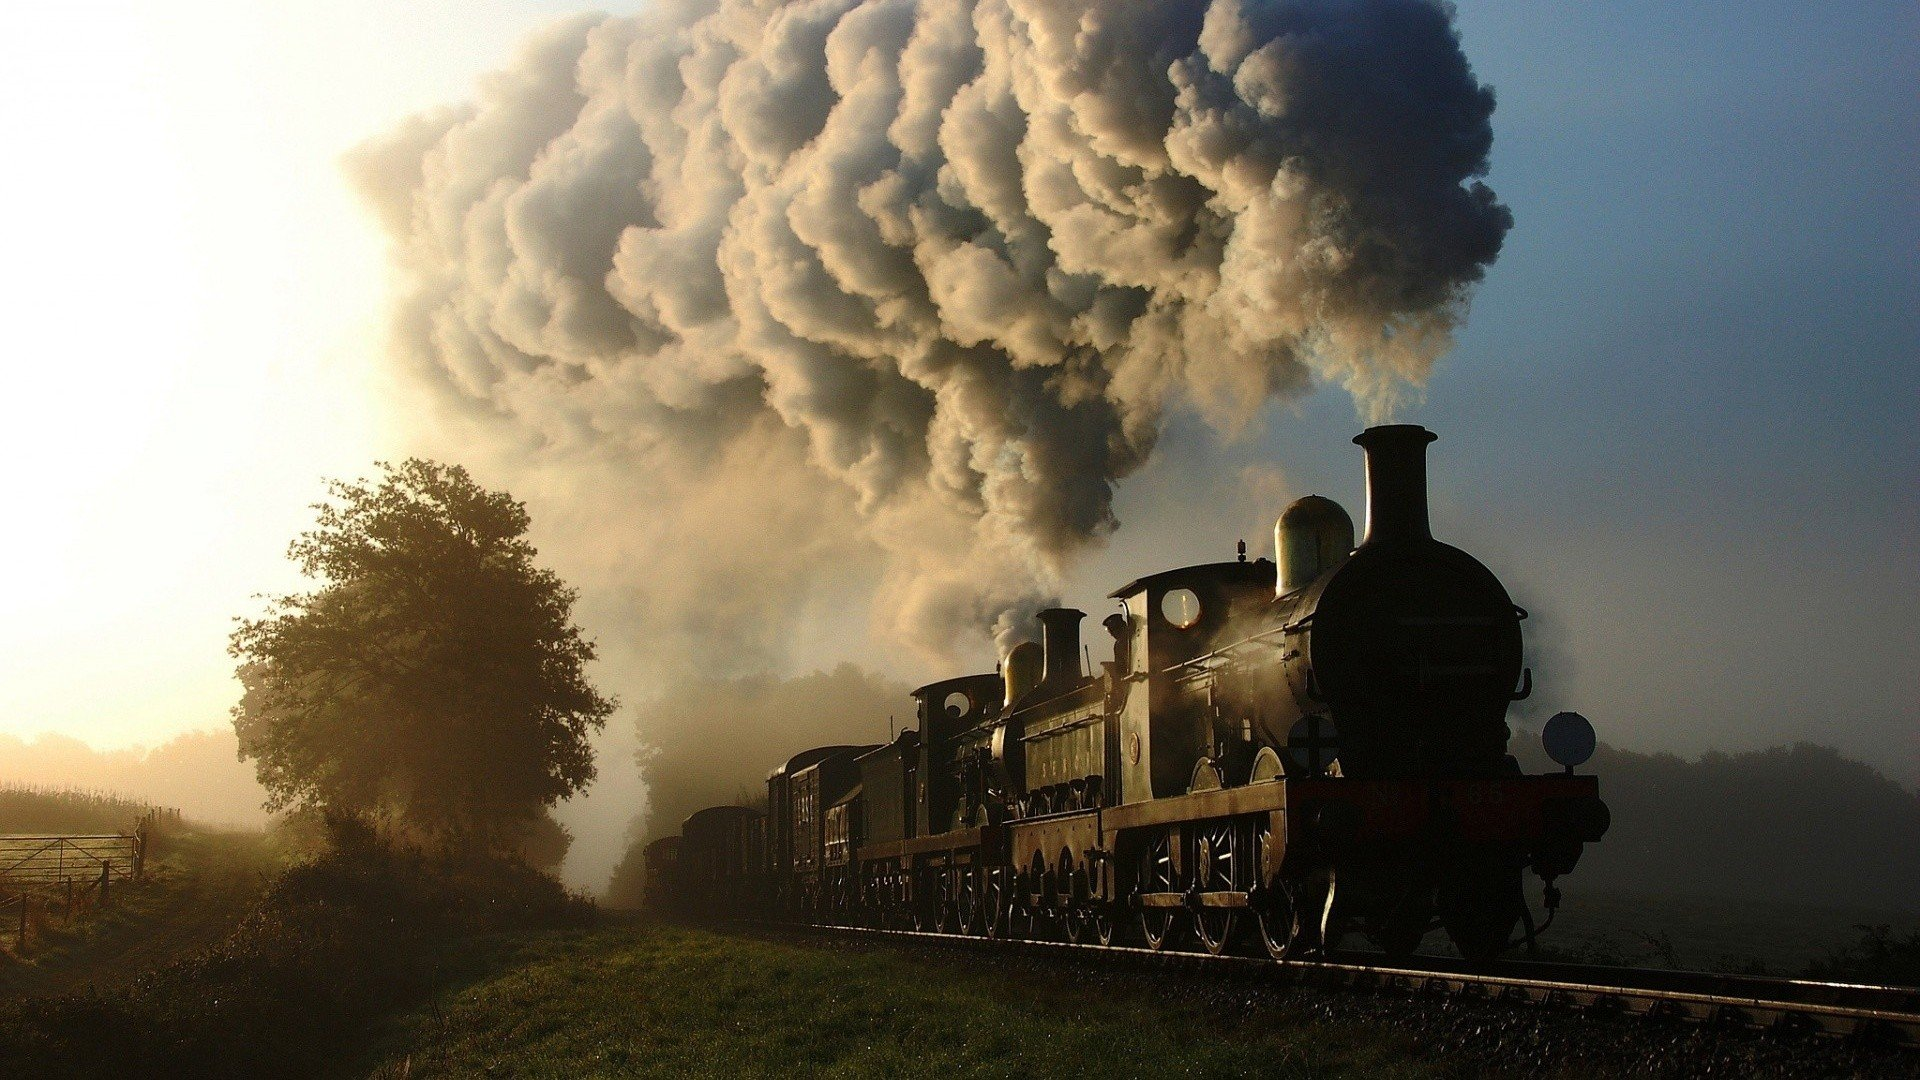 steam locomotive hd wallpapers - photo #3